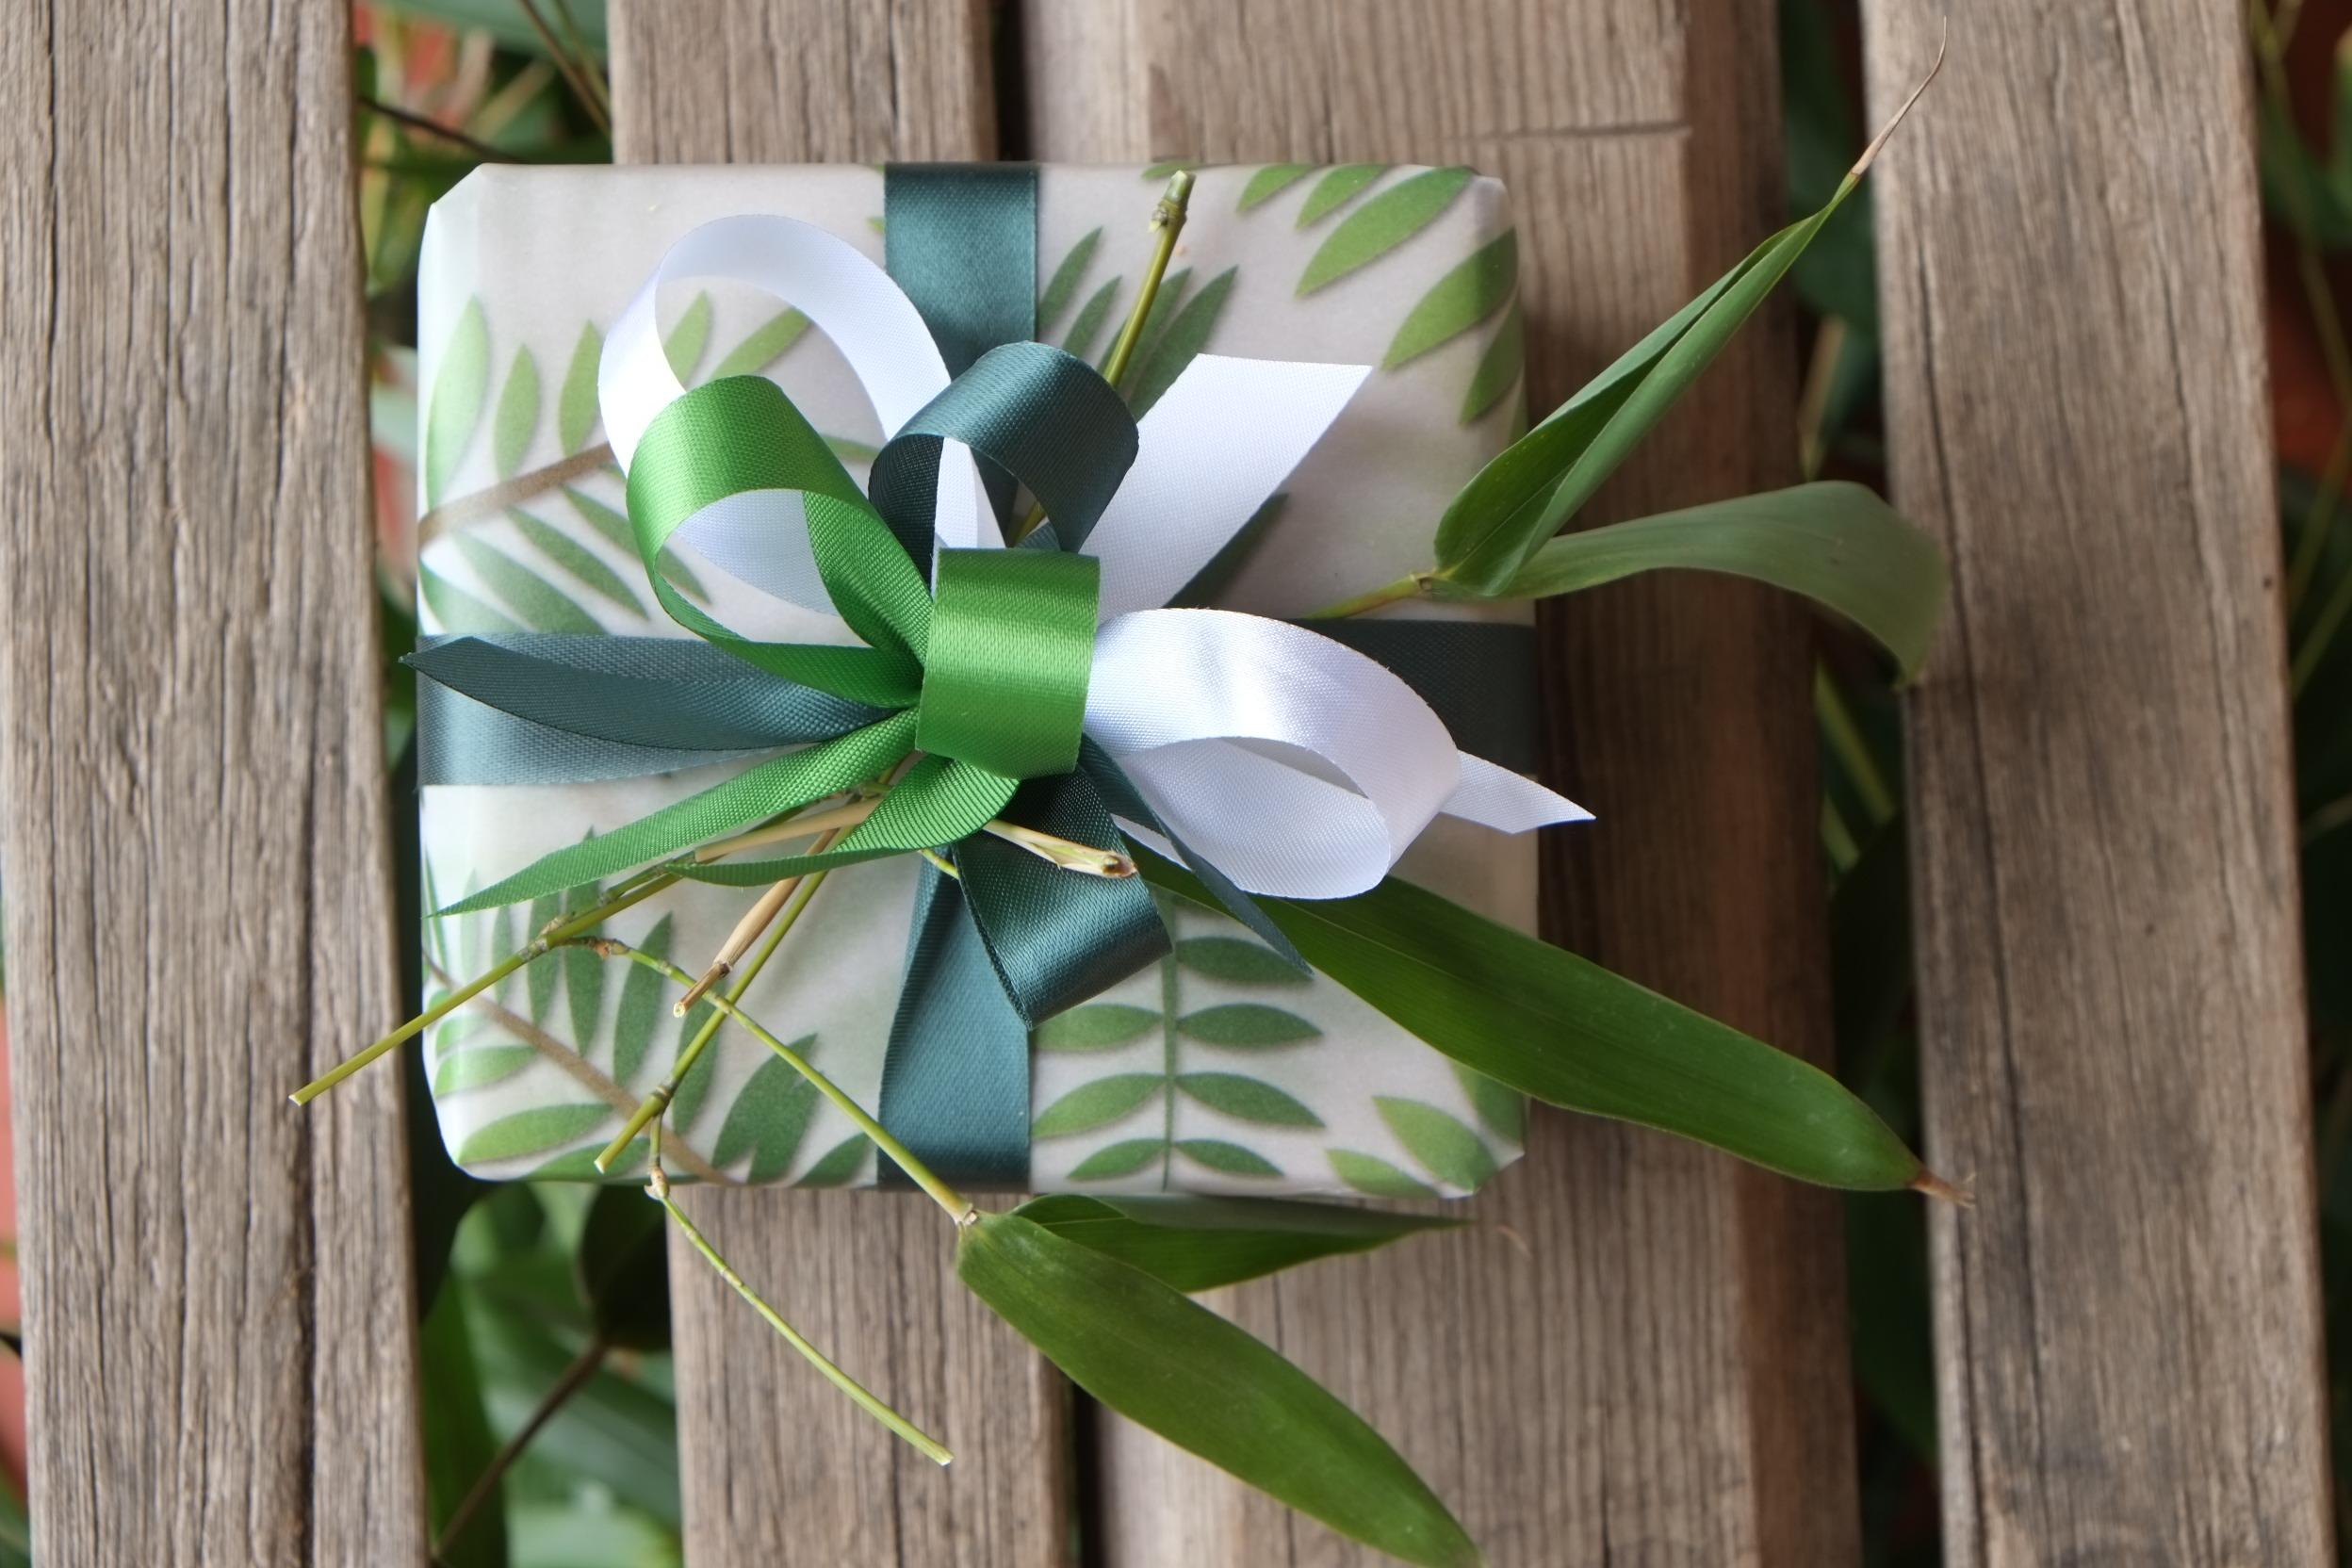 bamboe-strik-close-up-2.jpg